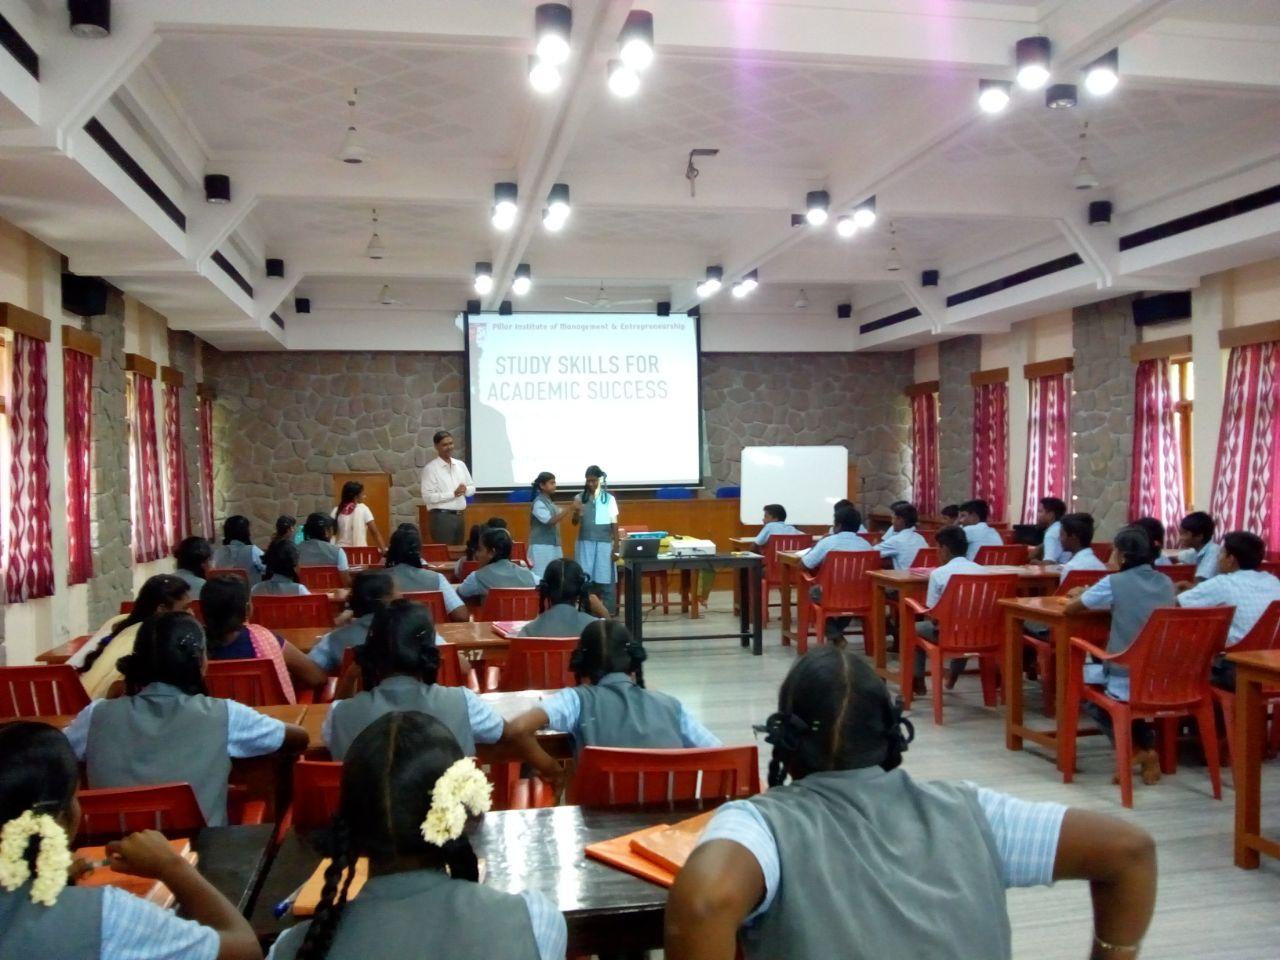 PIME - Study Skills for Academic Success